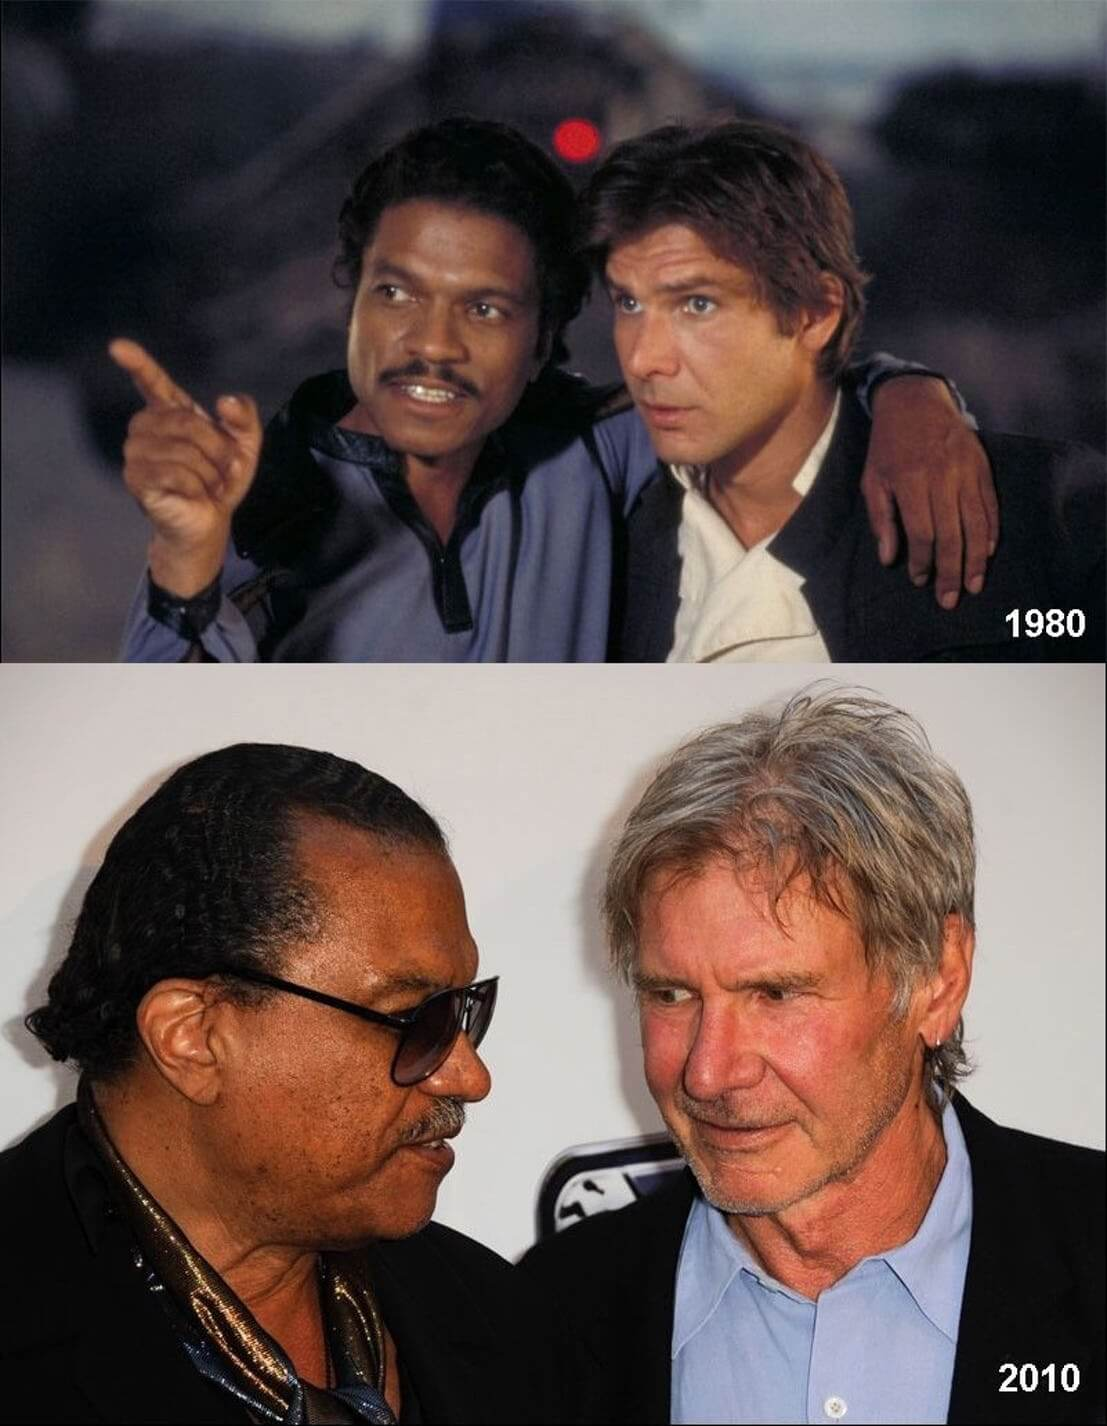 Solo And Lando Memes 5 (1)